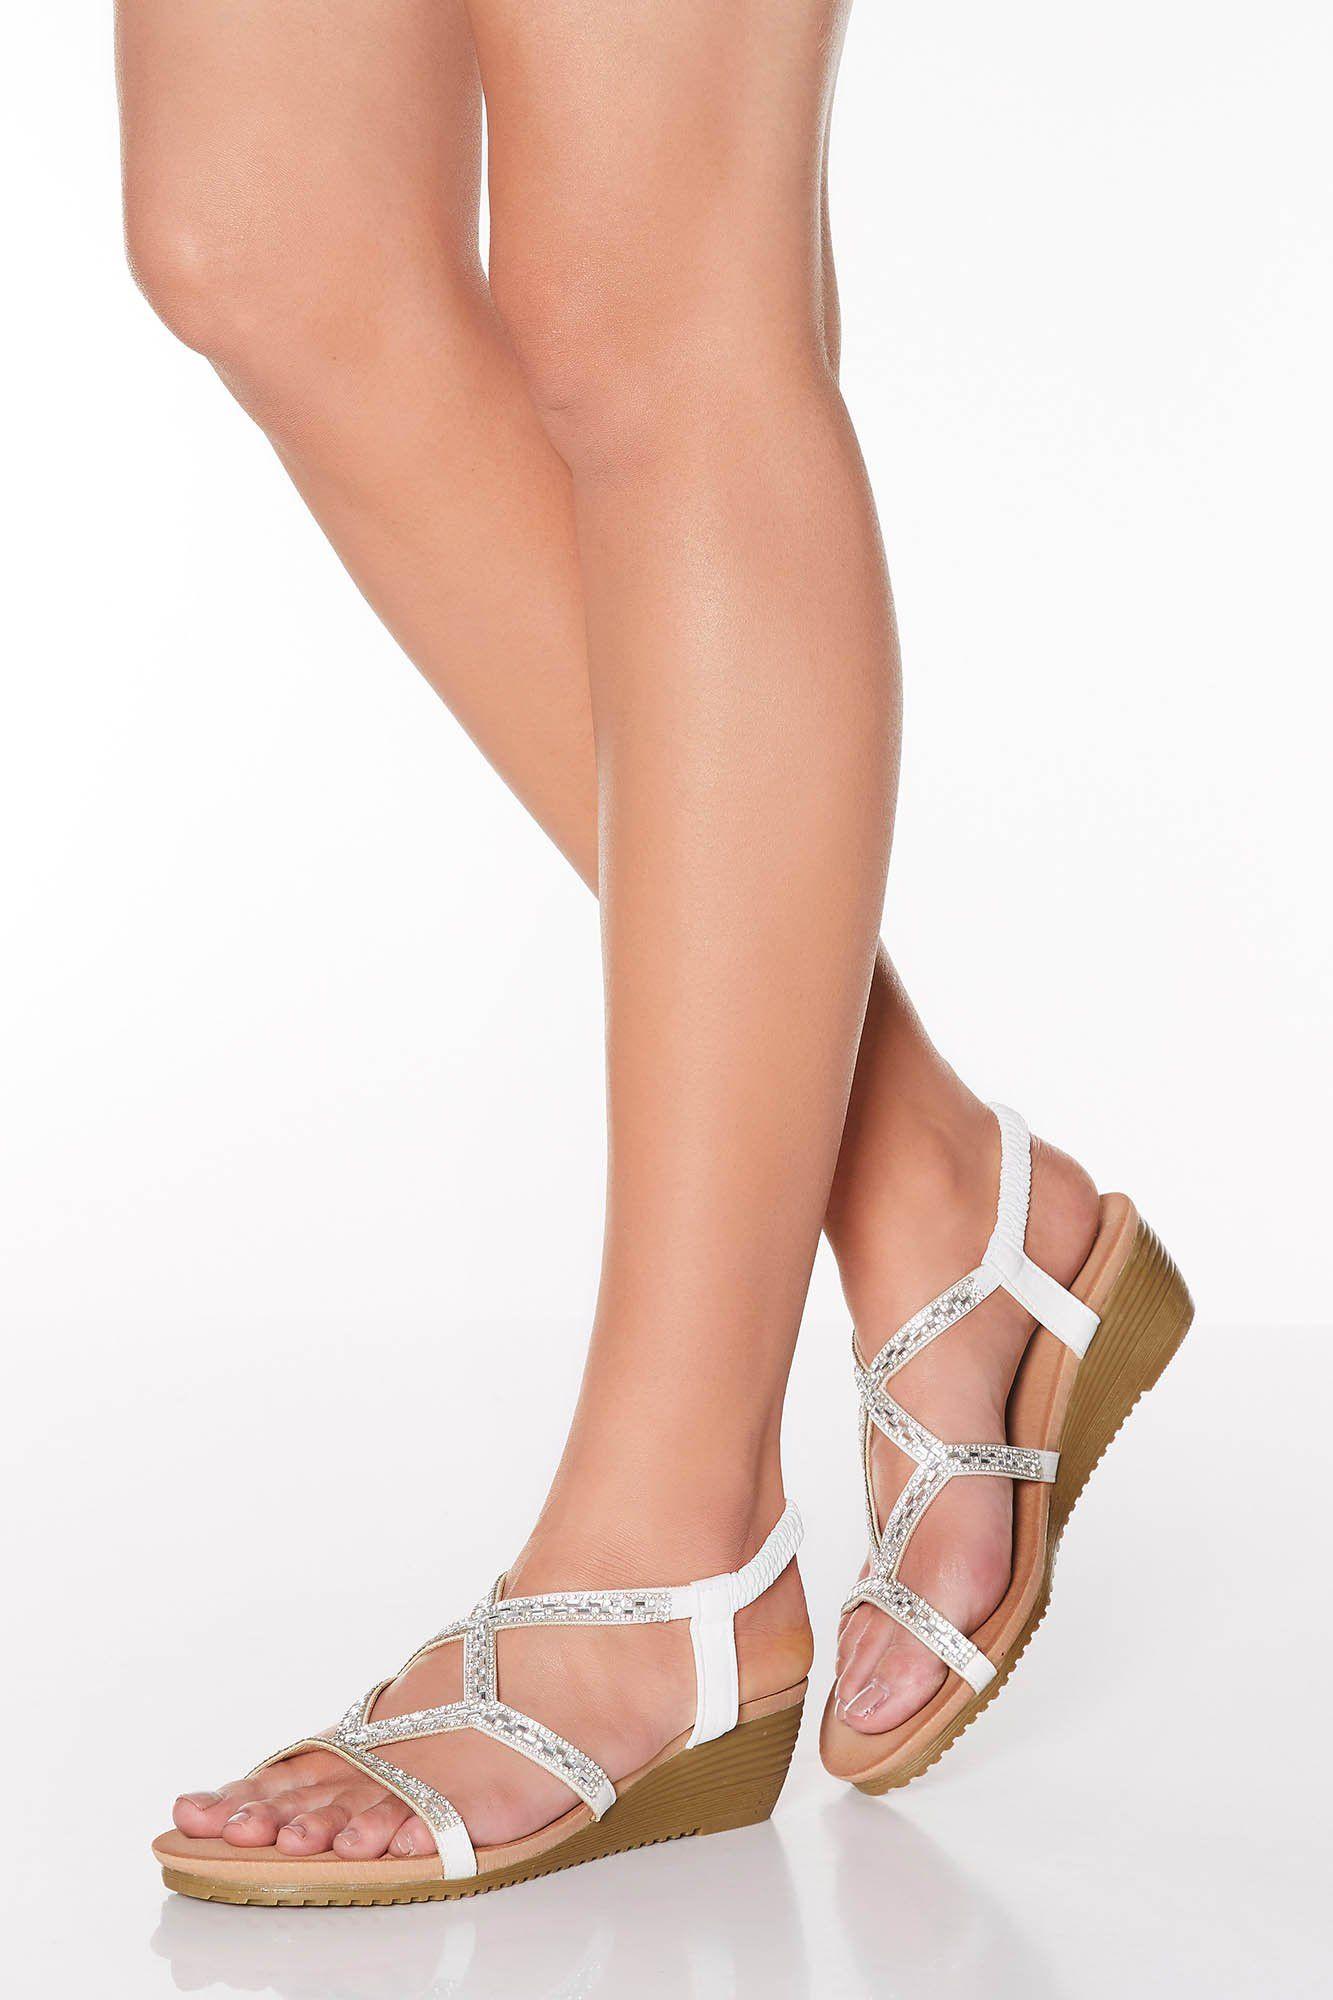 Quiz White Diamante Strappy Low Heel Wedges With Images Low Heel Wedges Low Heels Wedge Heels